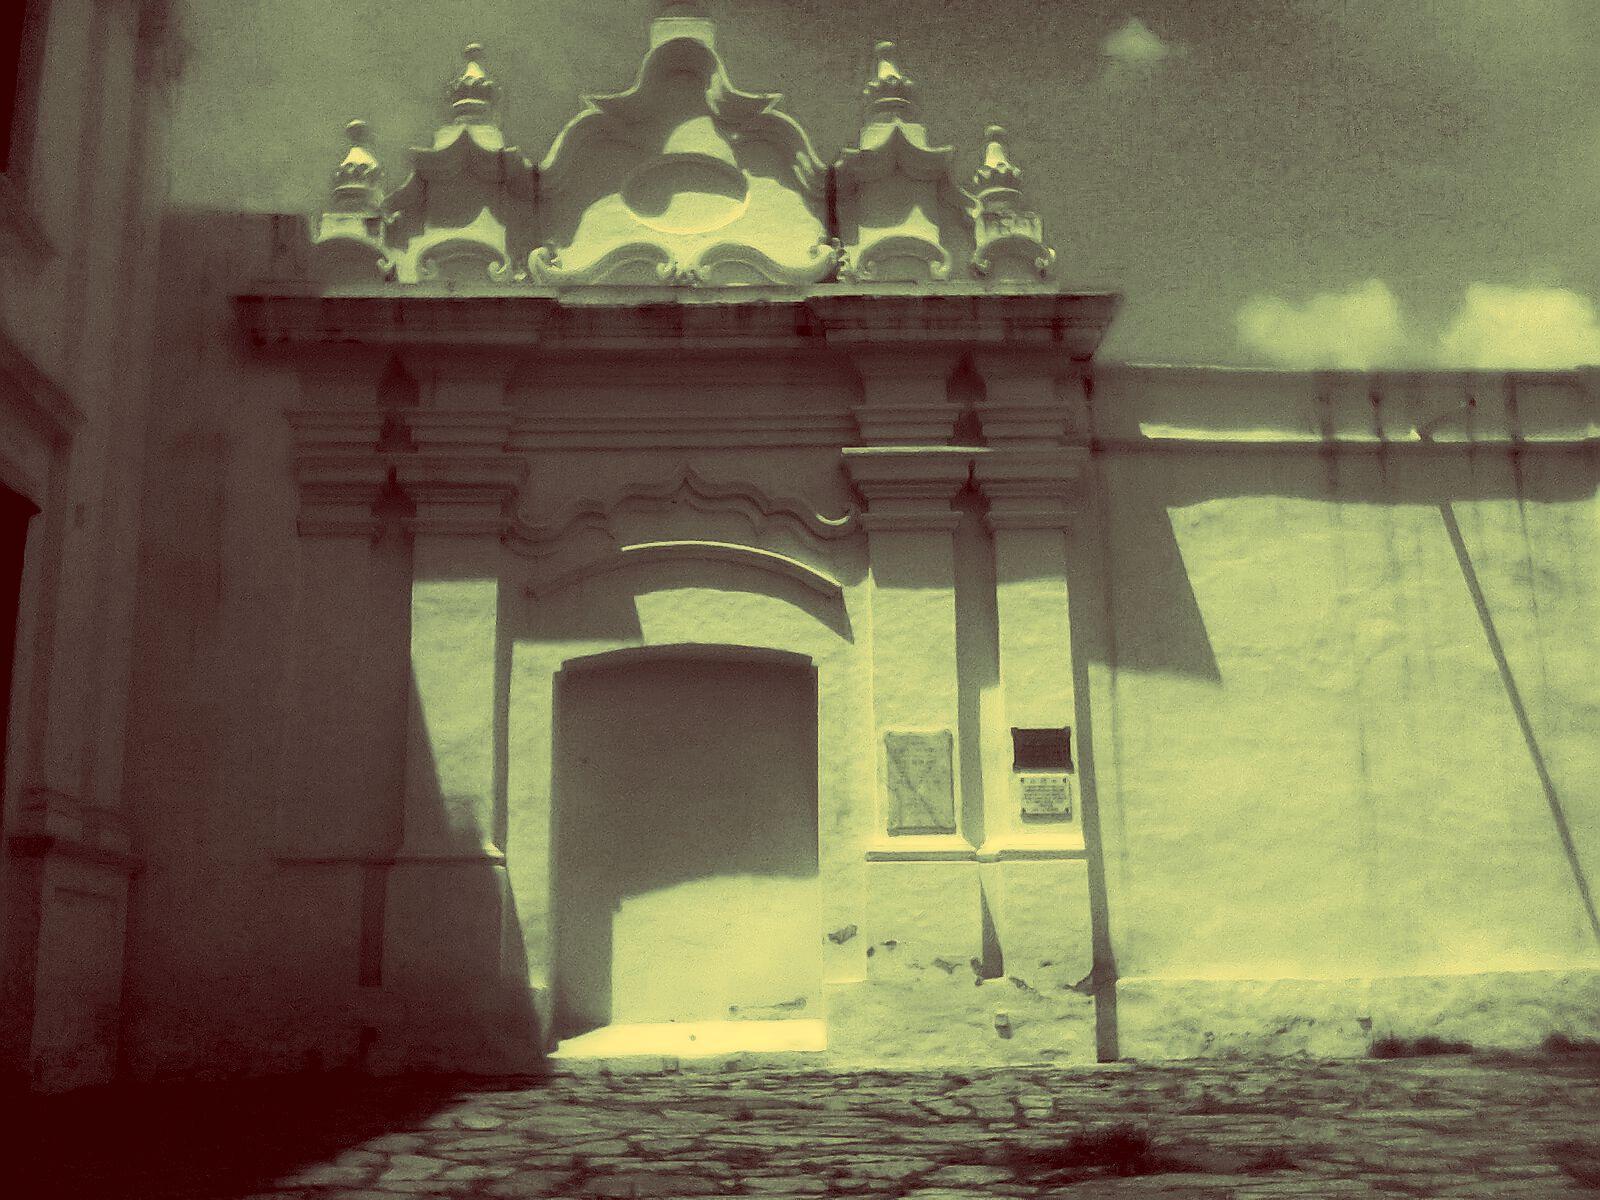 Convento, puerta clausurada